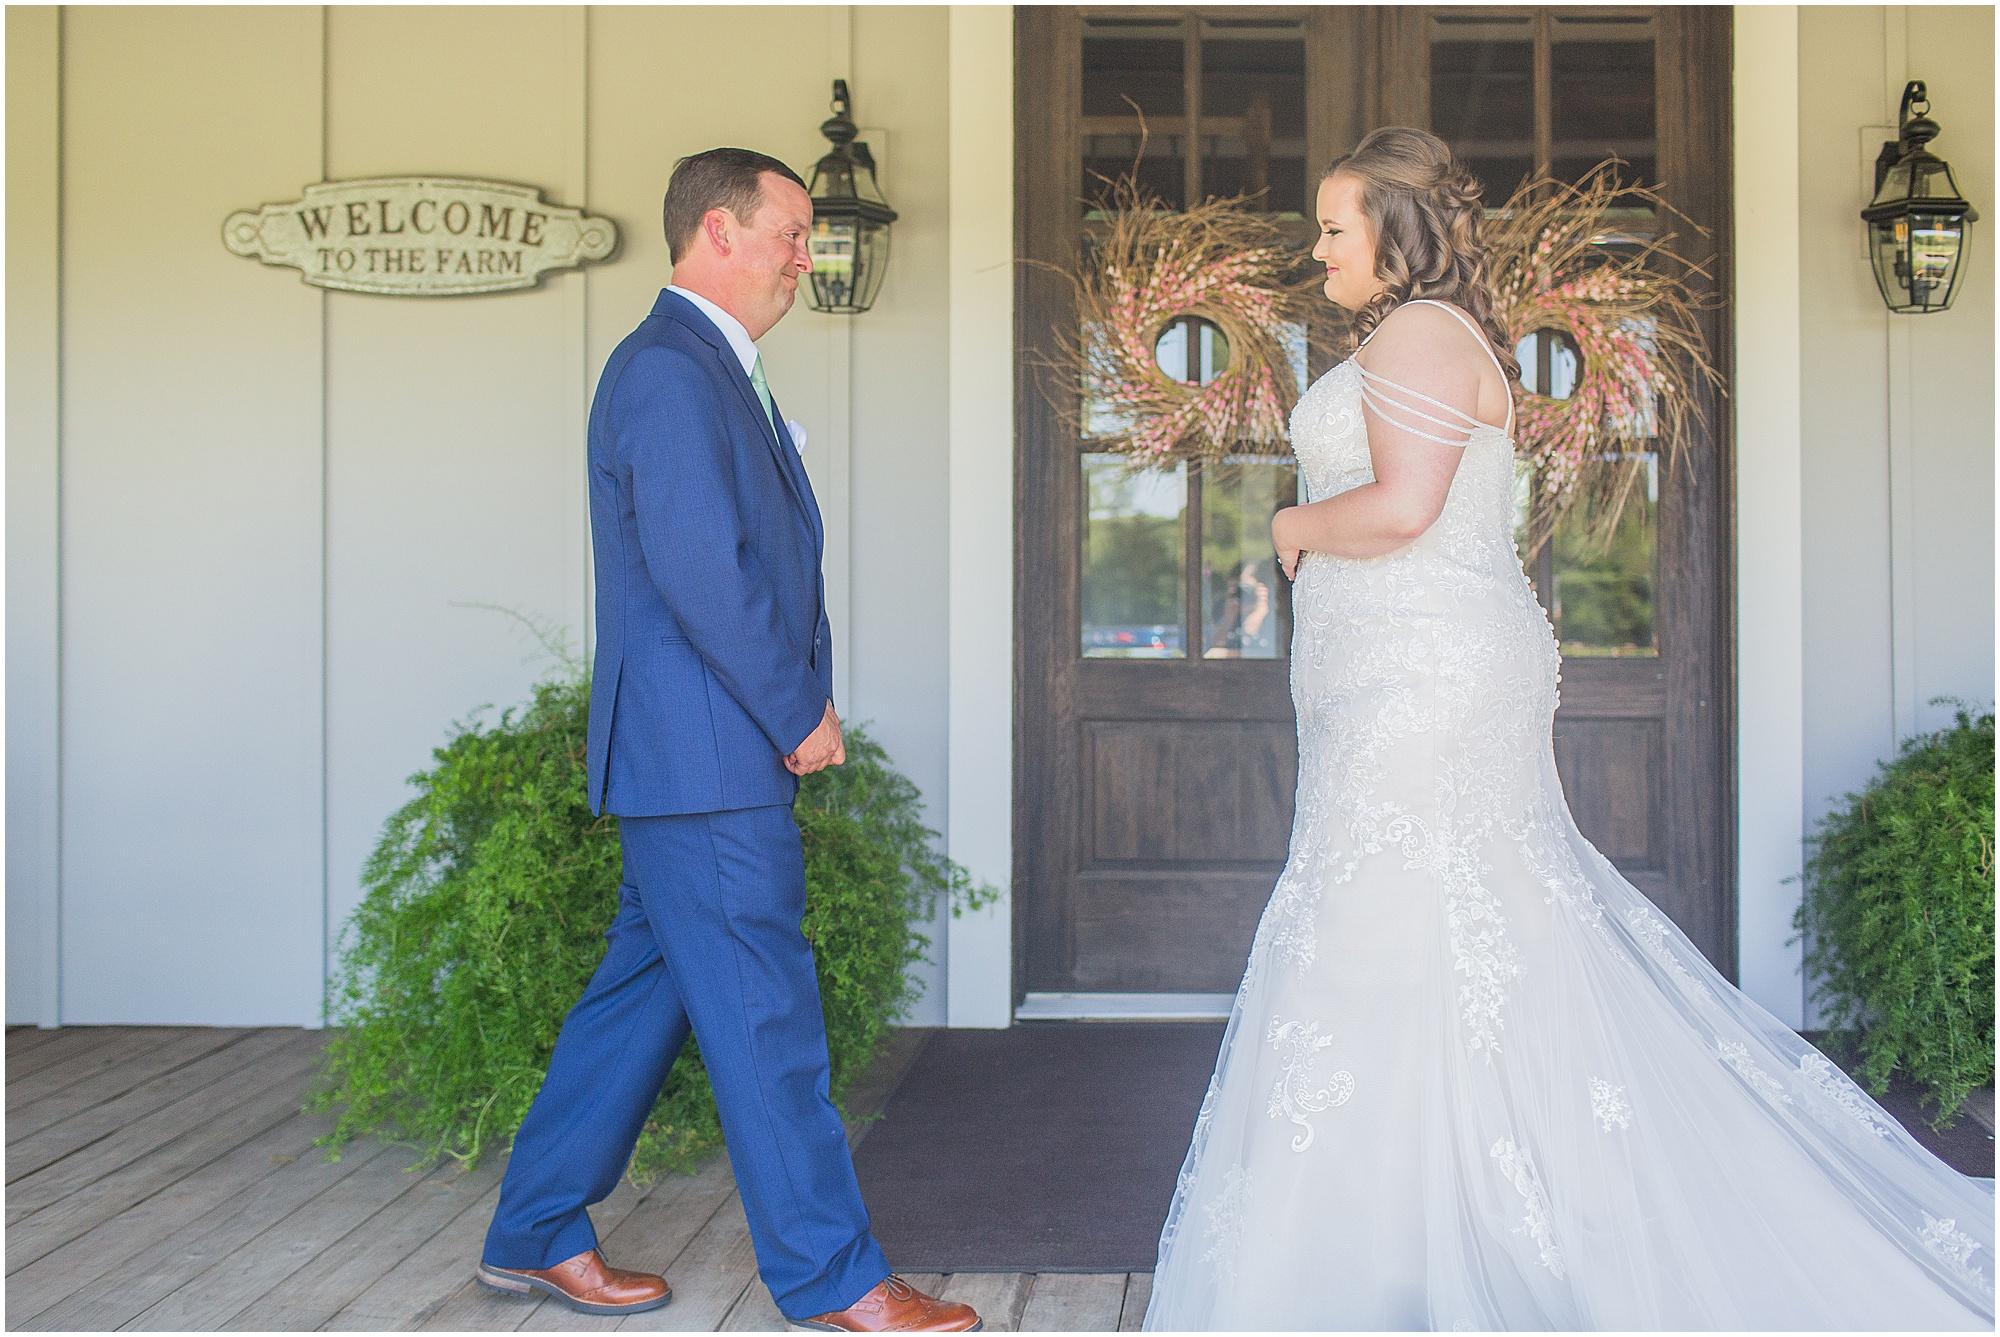 starkville-mississippi-wedding-page-place-dodson-farms_0016.jpg